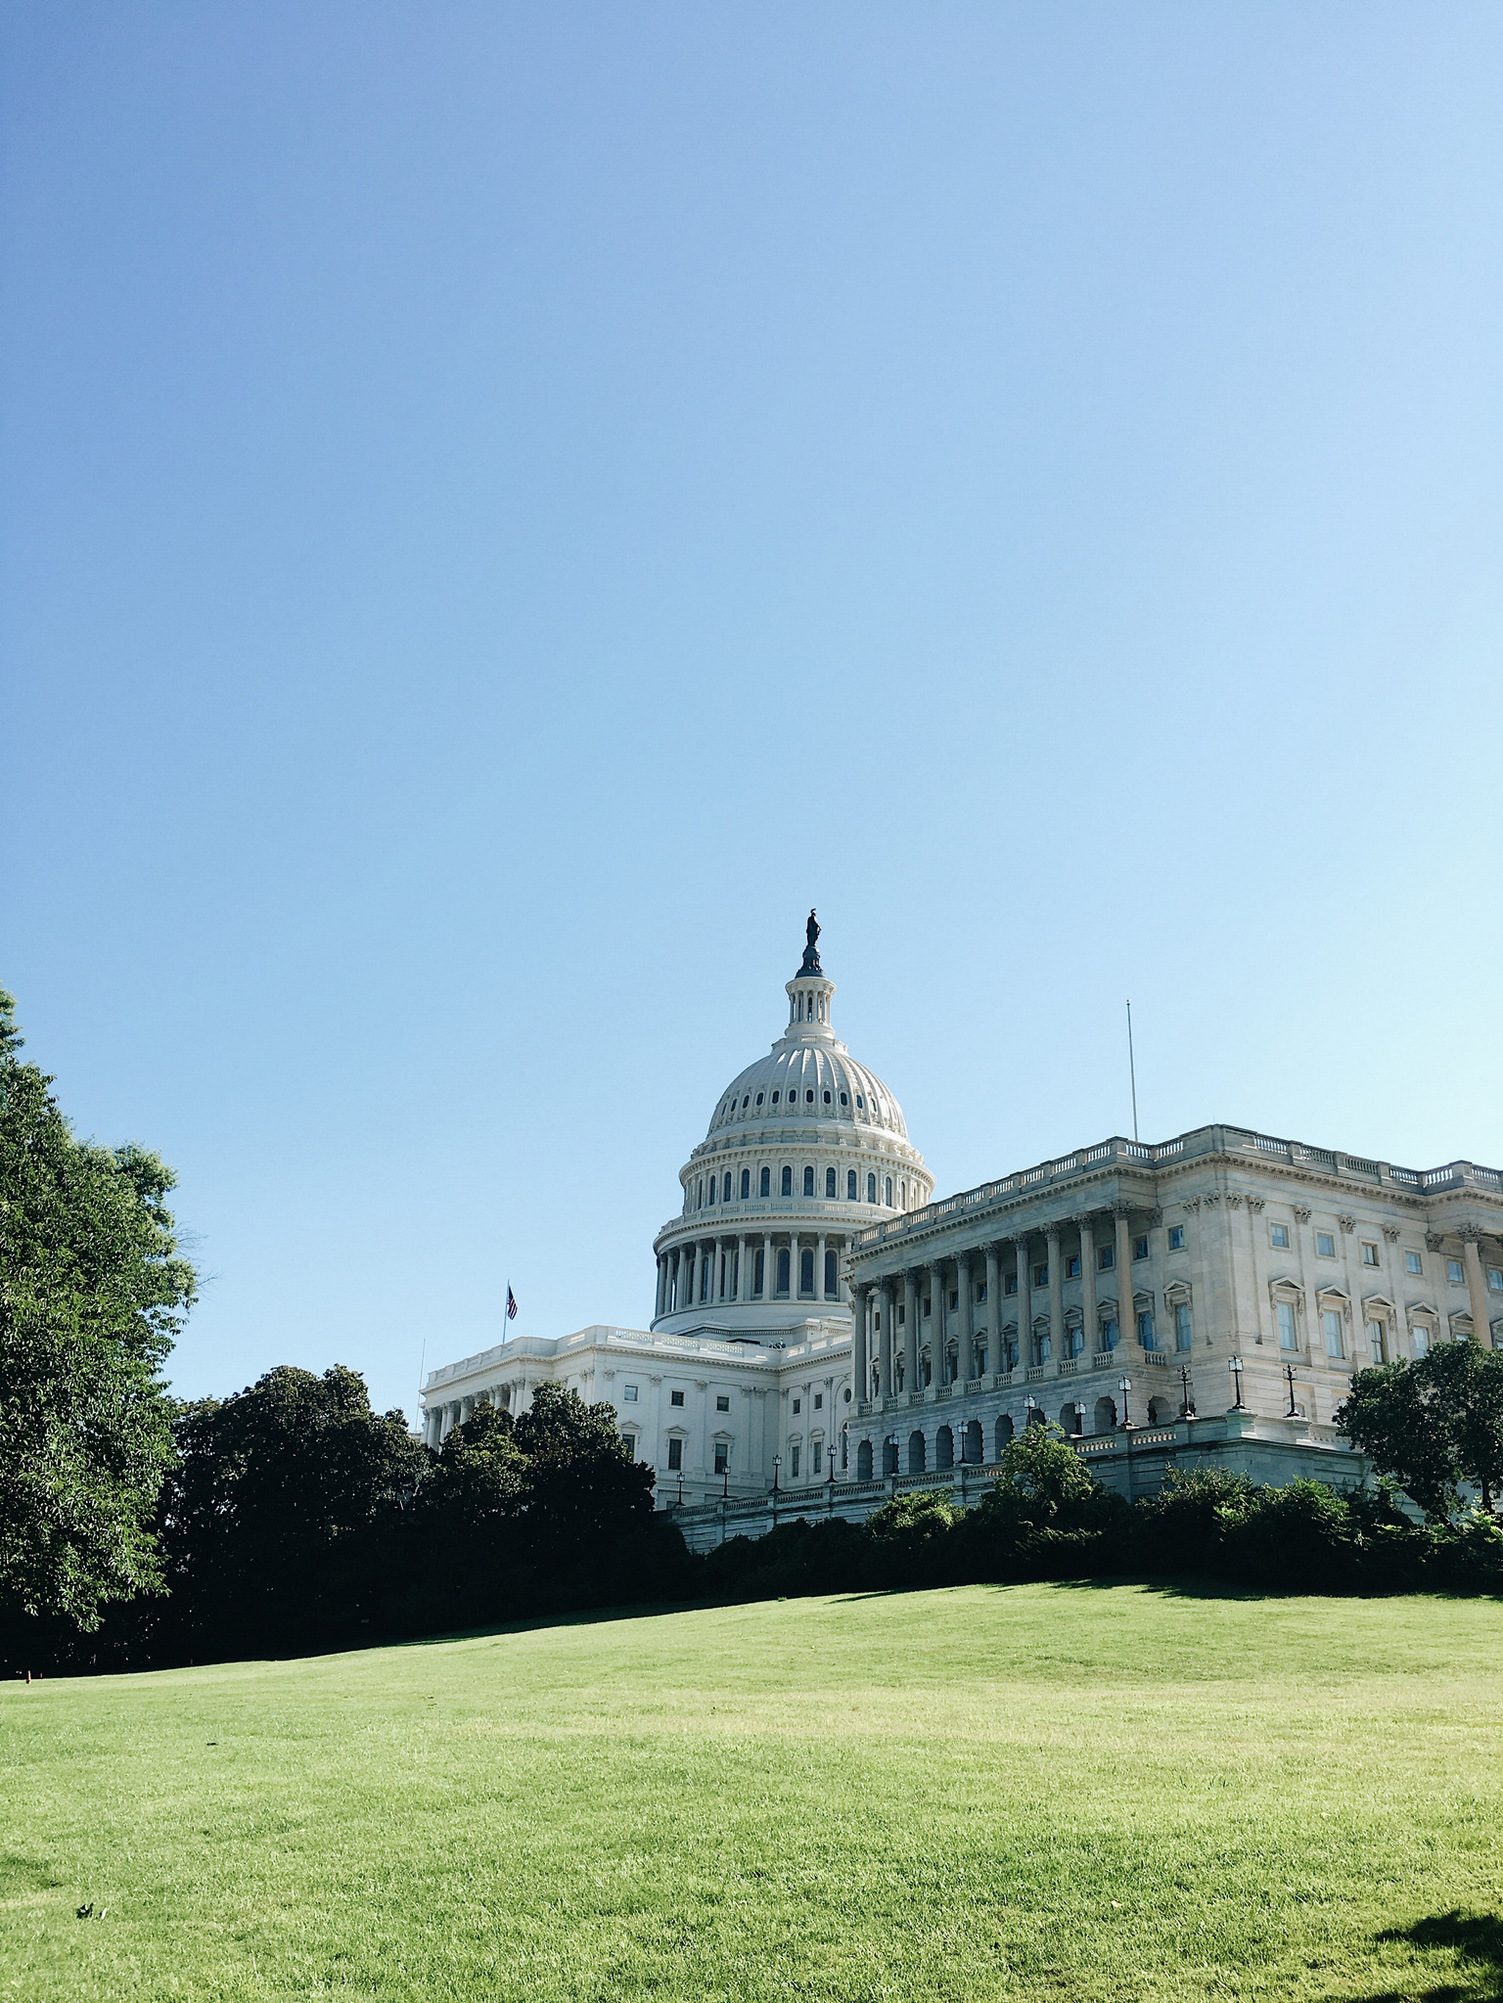 washington DC - the capitol